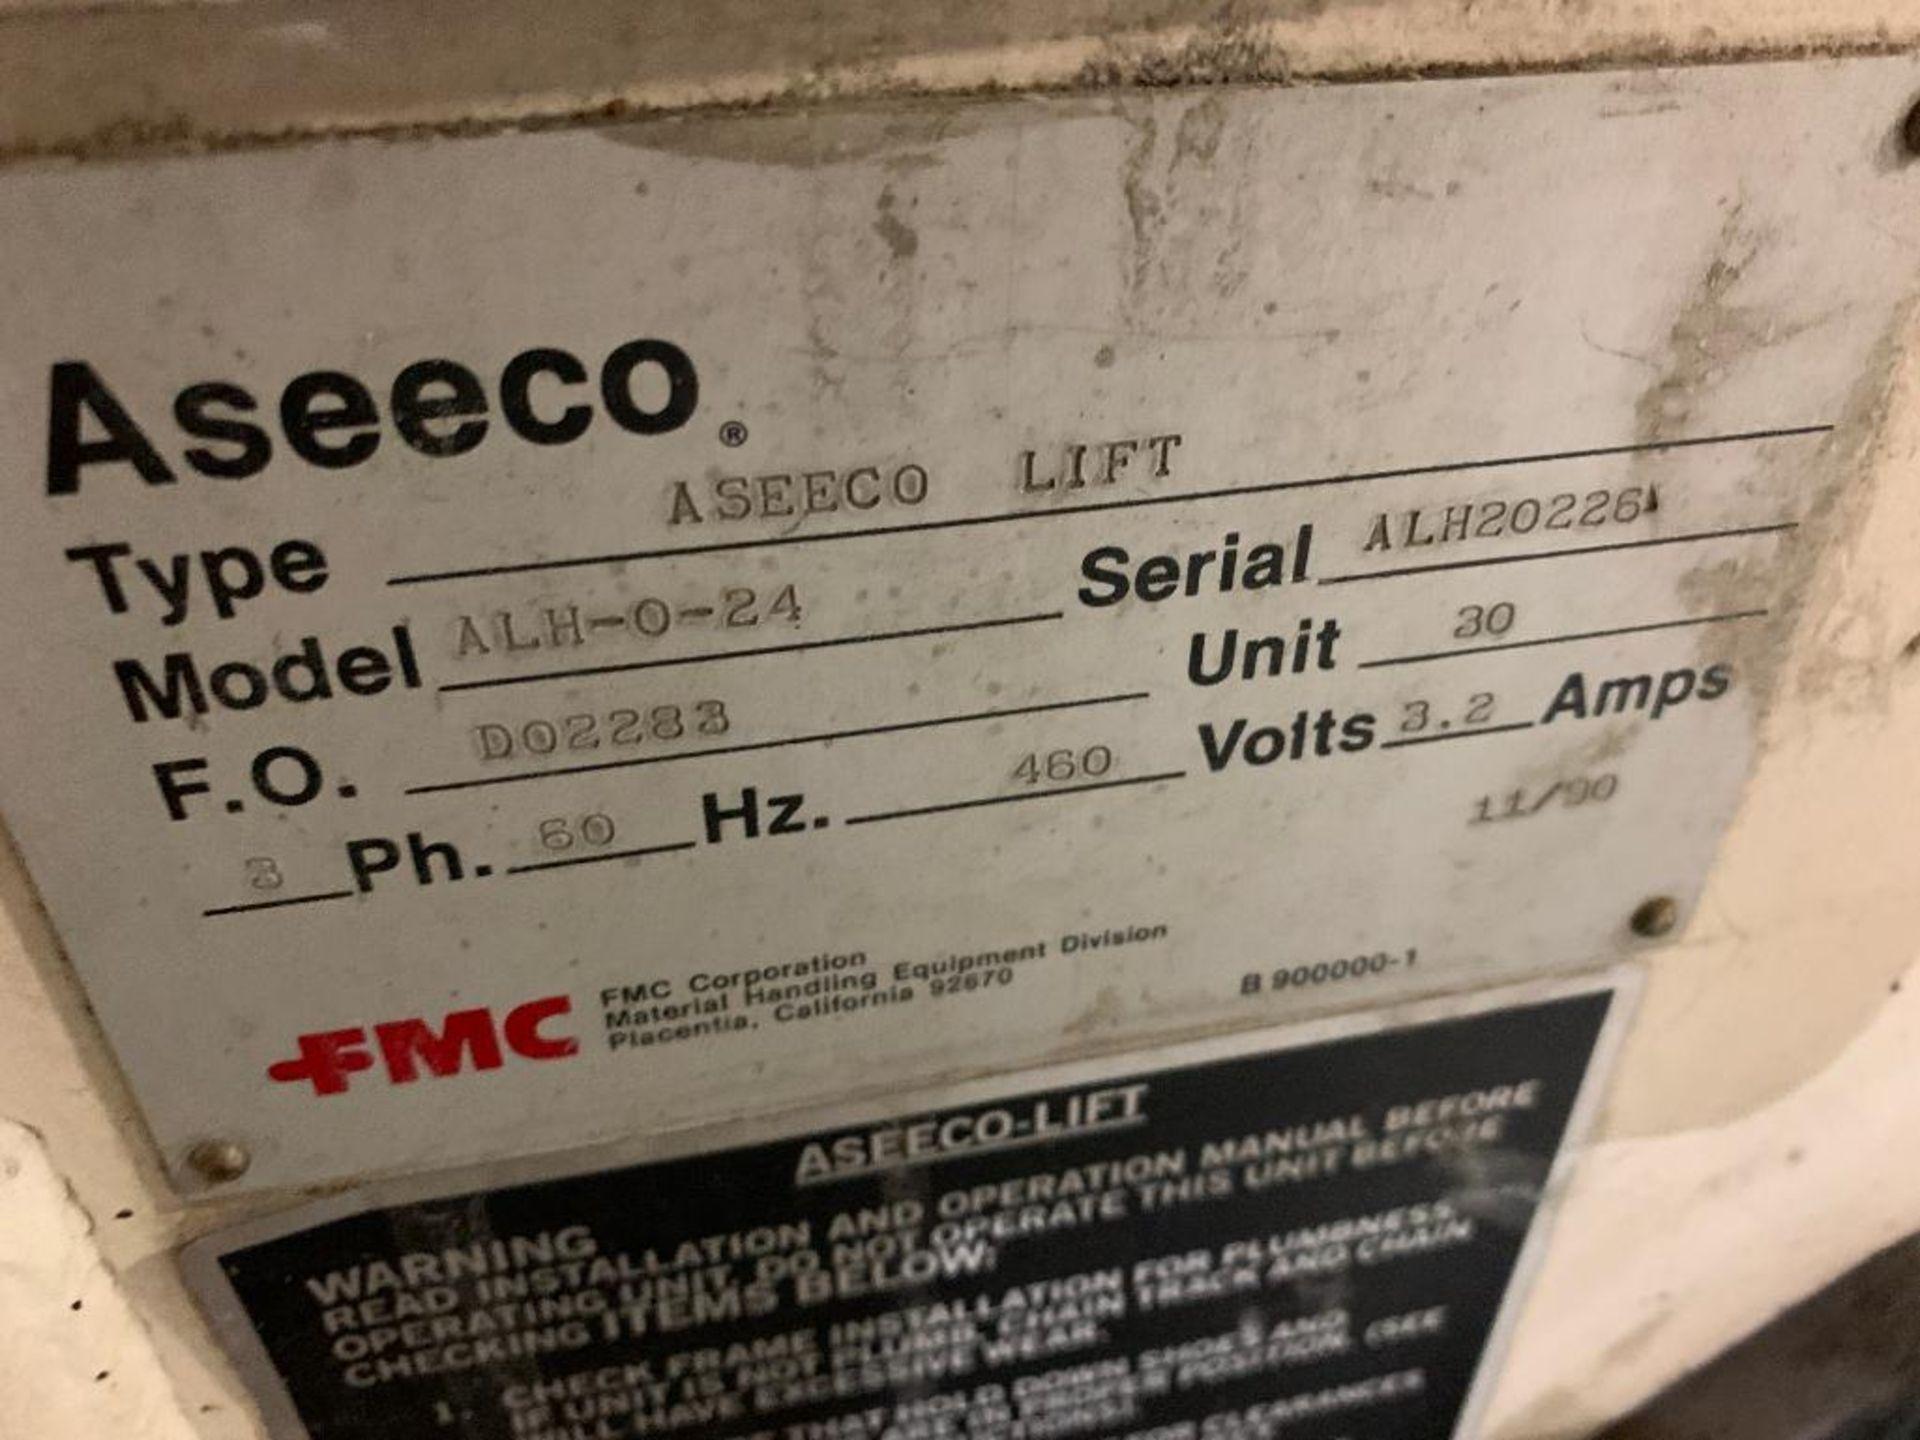 1992 Aseeco horizontal bucket elevator, model ALH-0-24-CP - Image 4 of 18